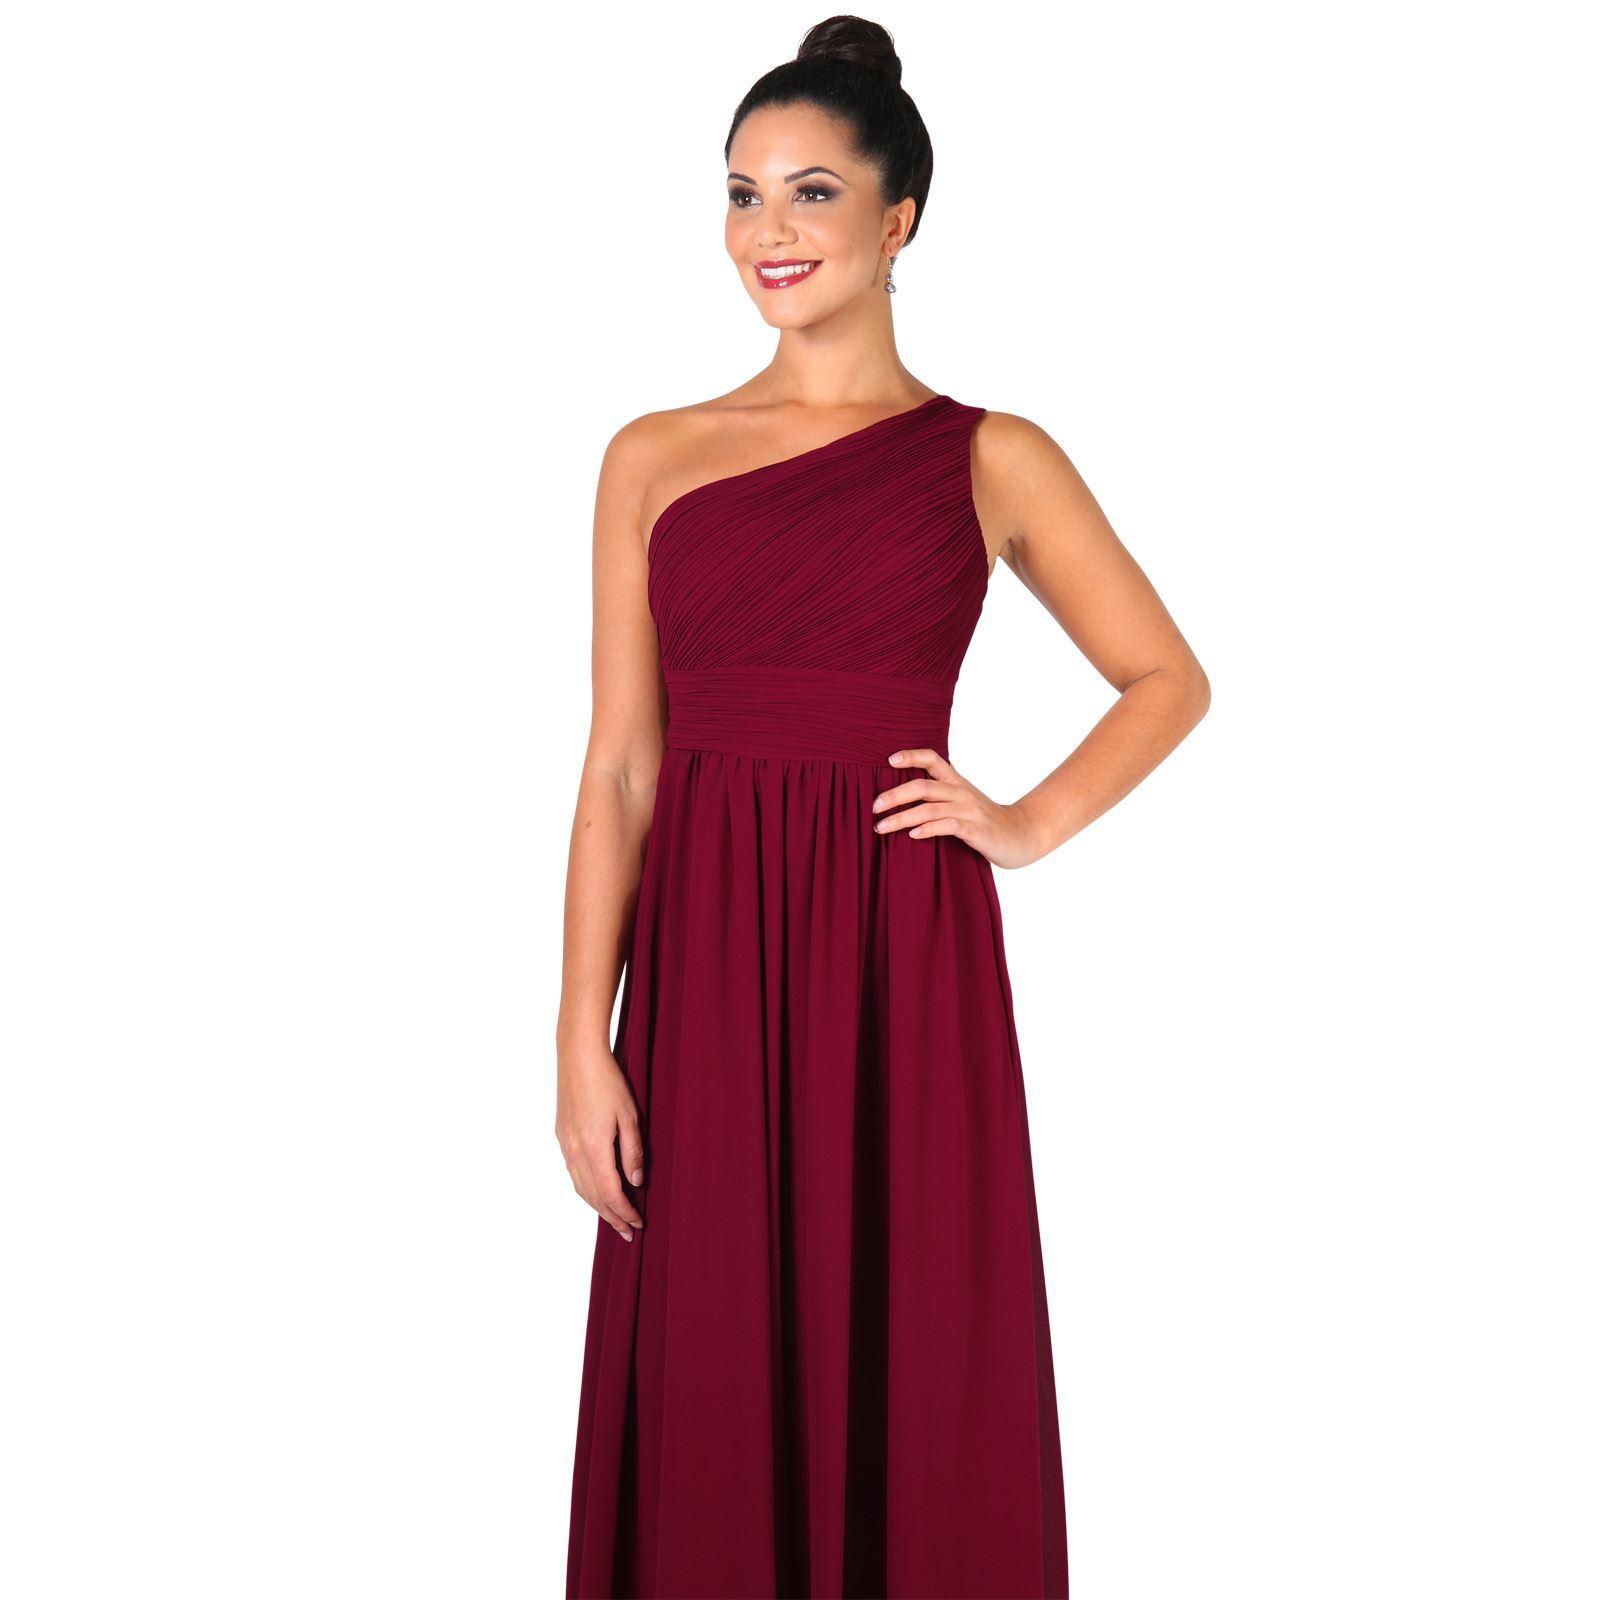 Womens-Wedding-Bridesmaid-Prom-Dress-Formal-One-Off-Shoulder-Long-Evening-8-18 thumbnail 81